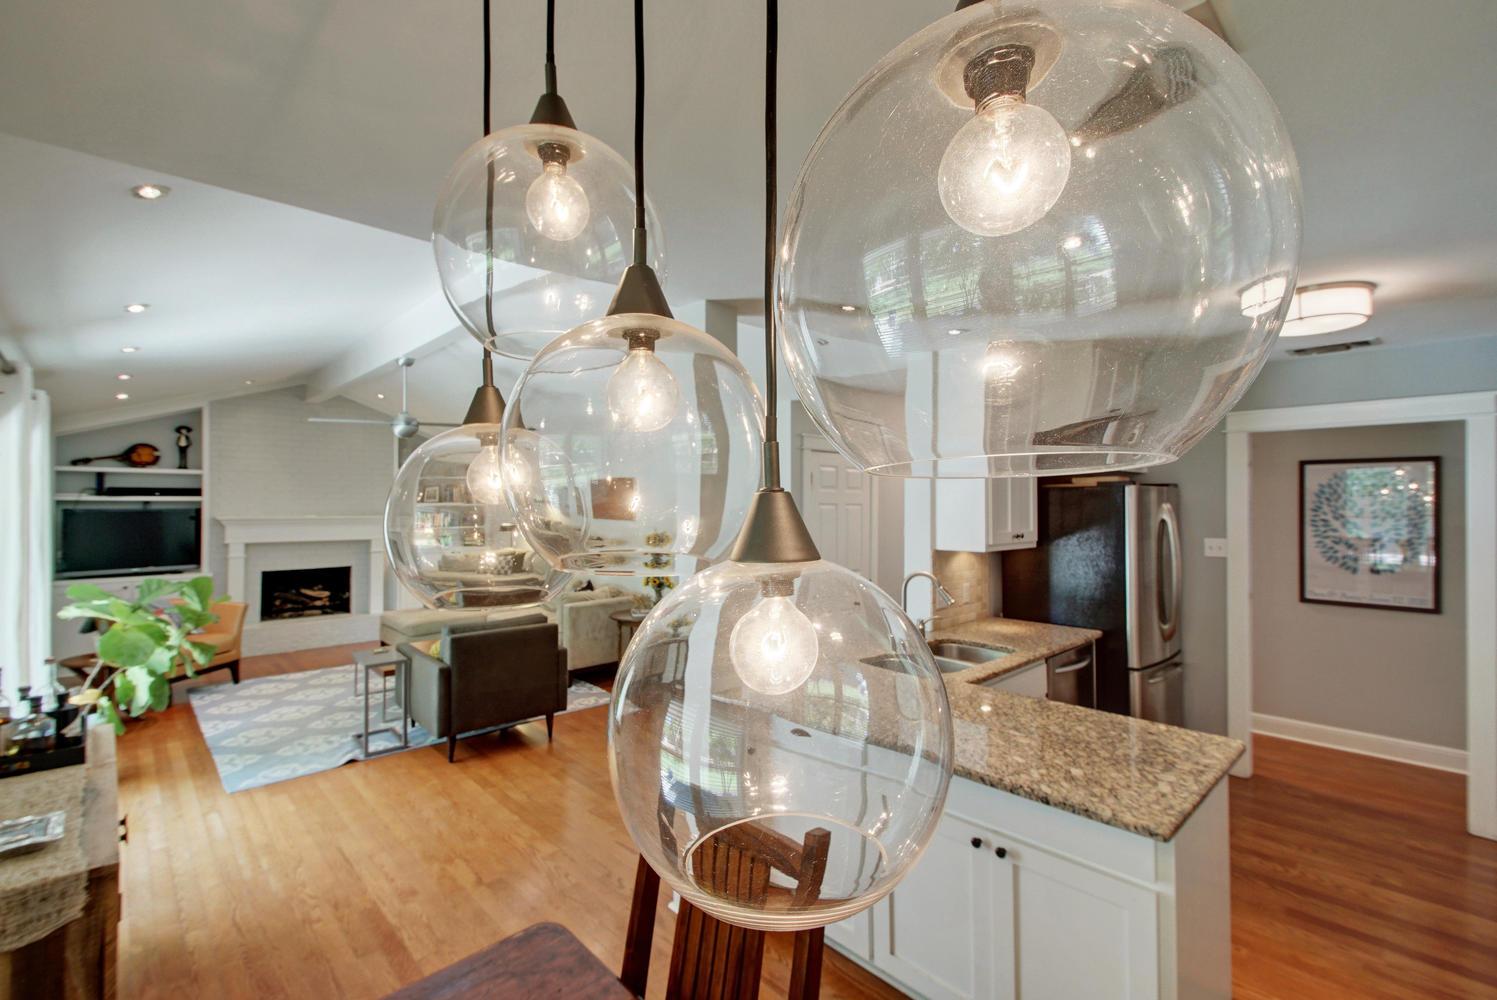 3201 Whitepine Dr-large-019-Family Kitchen Dining 466-1498x1000-72dpi.jpg